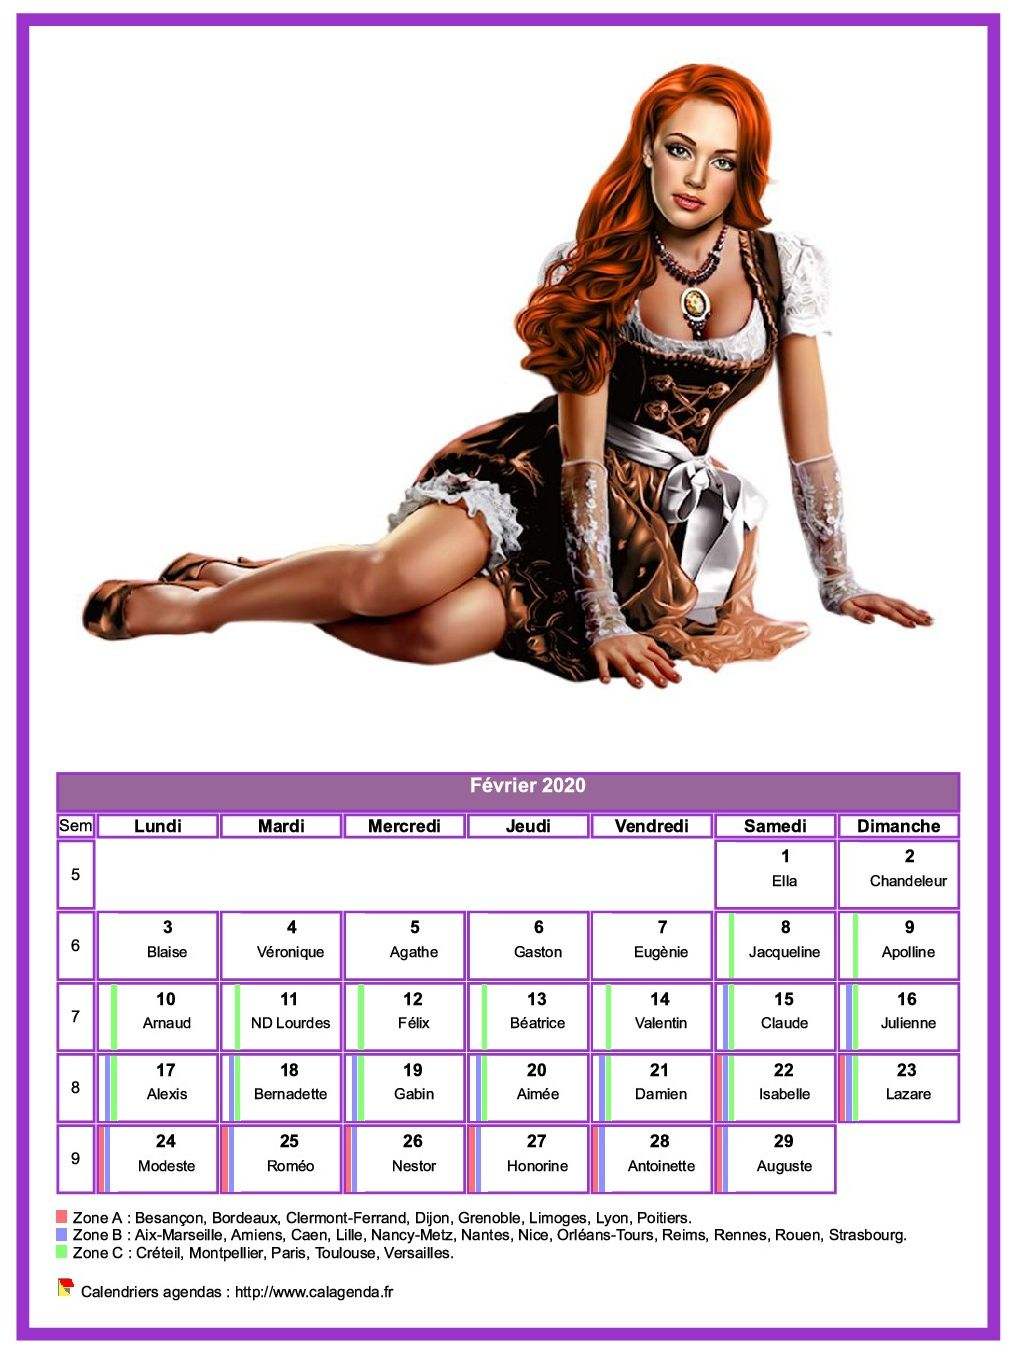 Calendrier février 2020 femmes